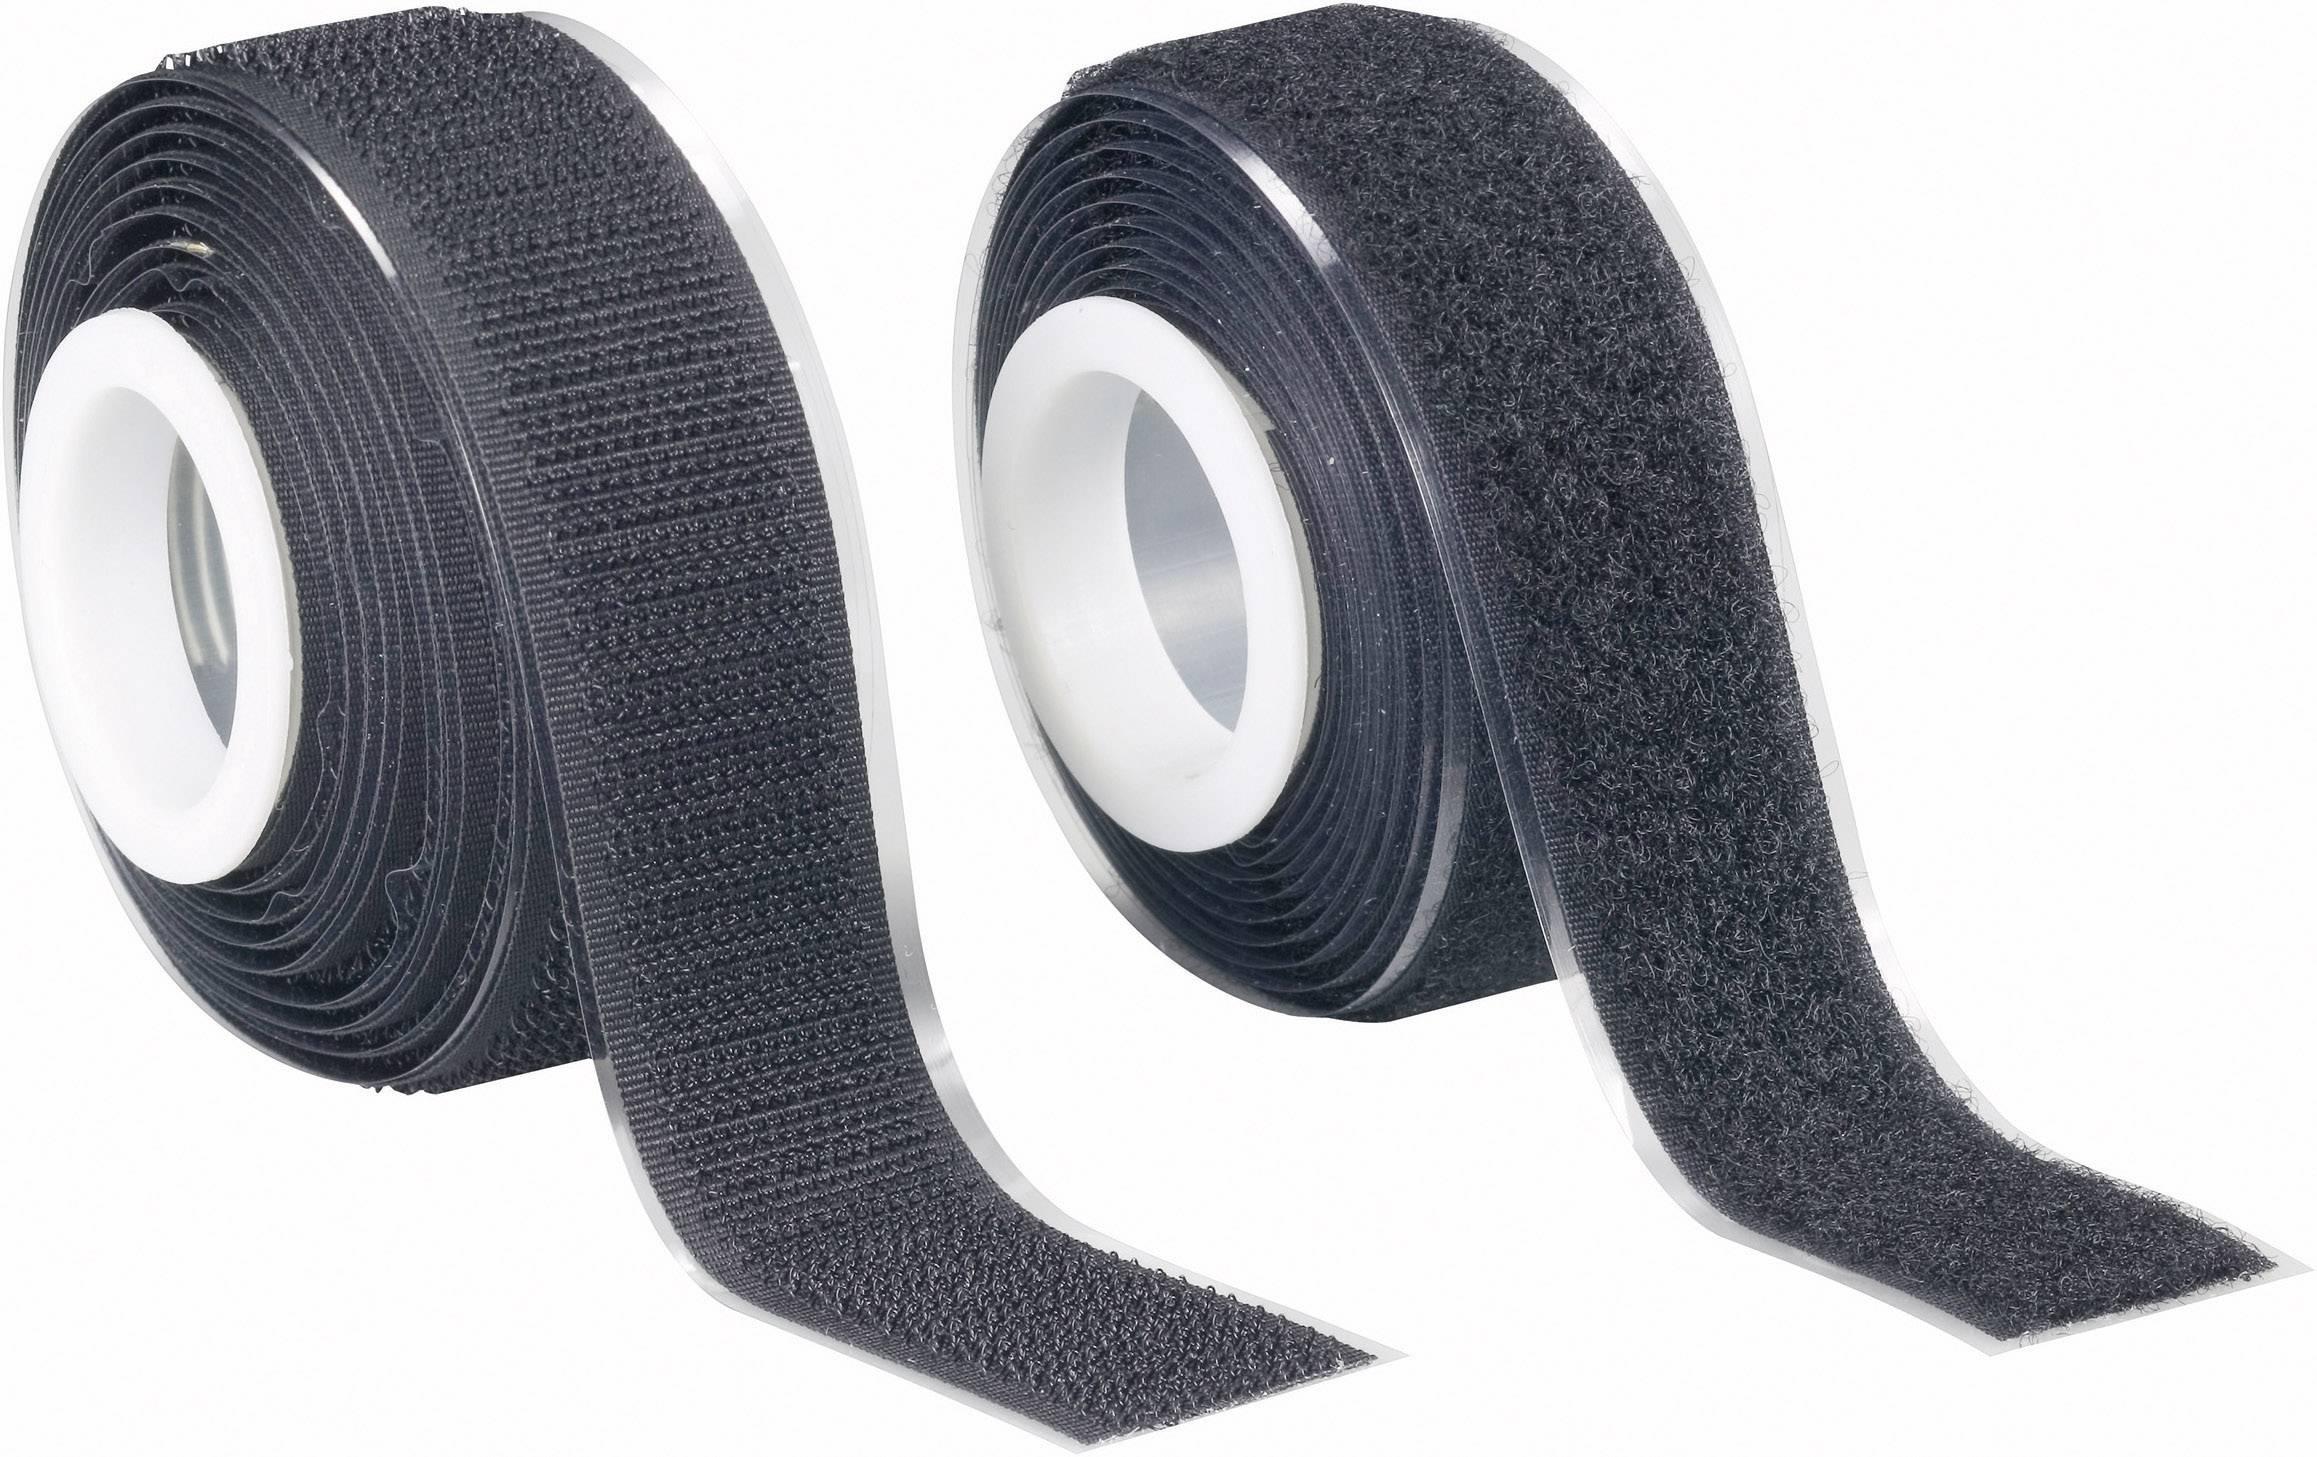 Lepiaci pásik so suchým zipsom Fastech 919-330-B, (d x š) 2000 mm x 25 mm, čierna, 1 pár